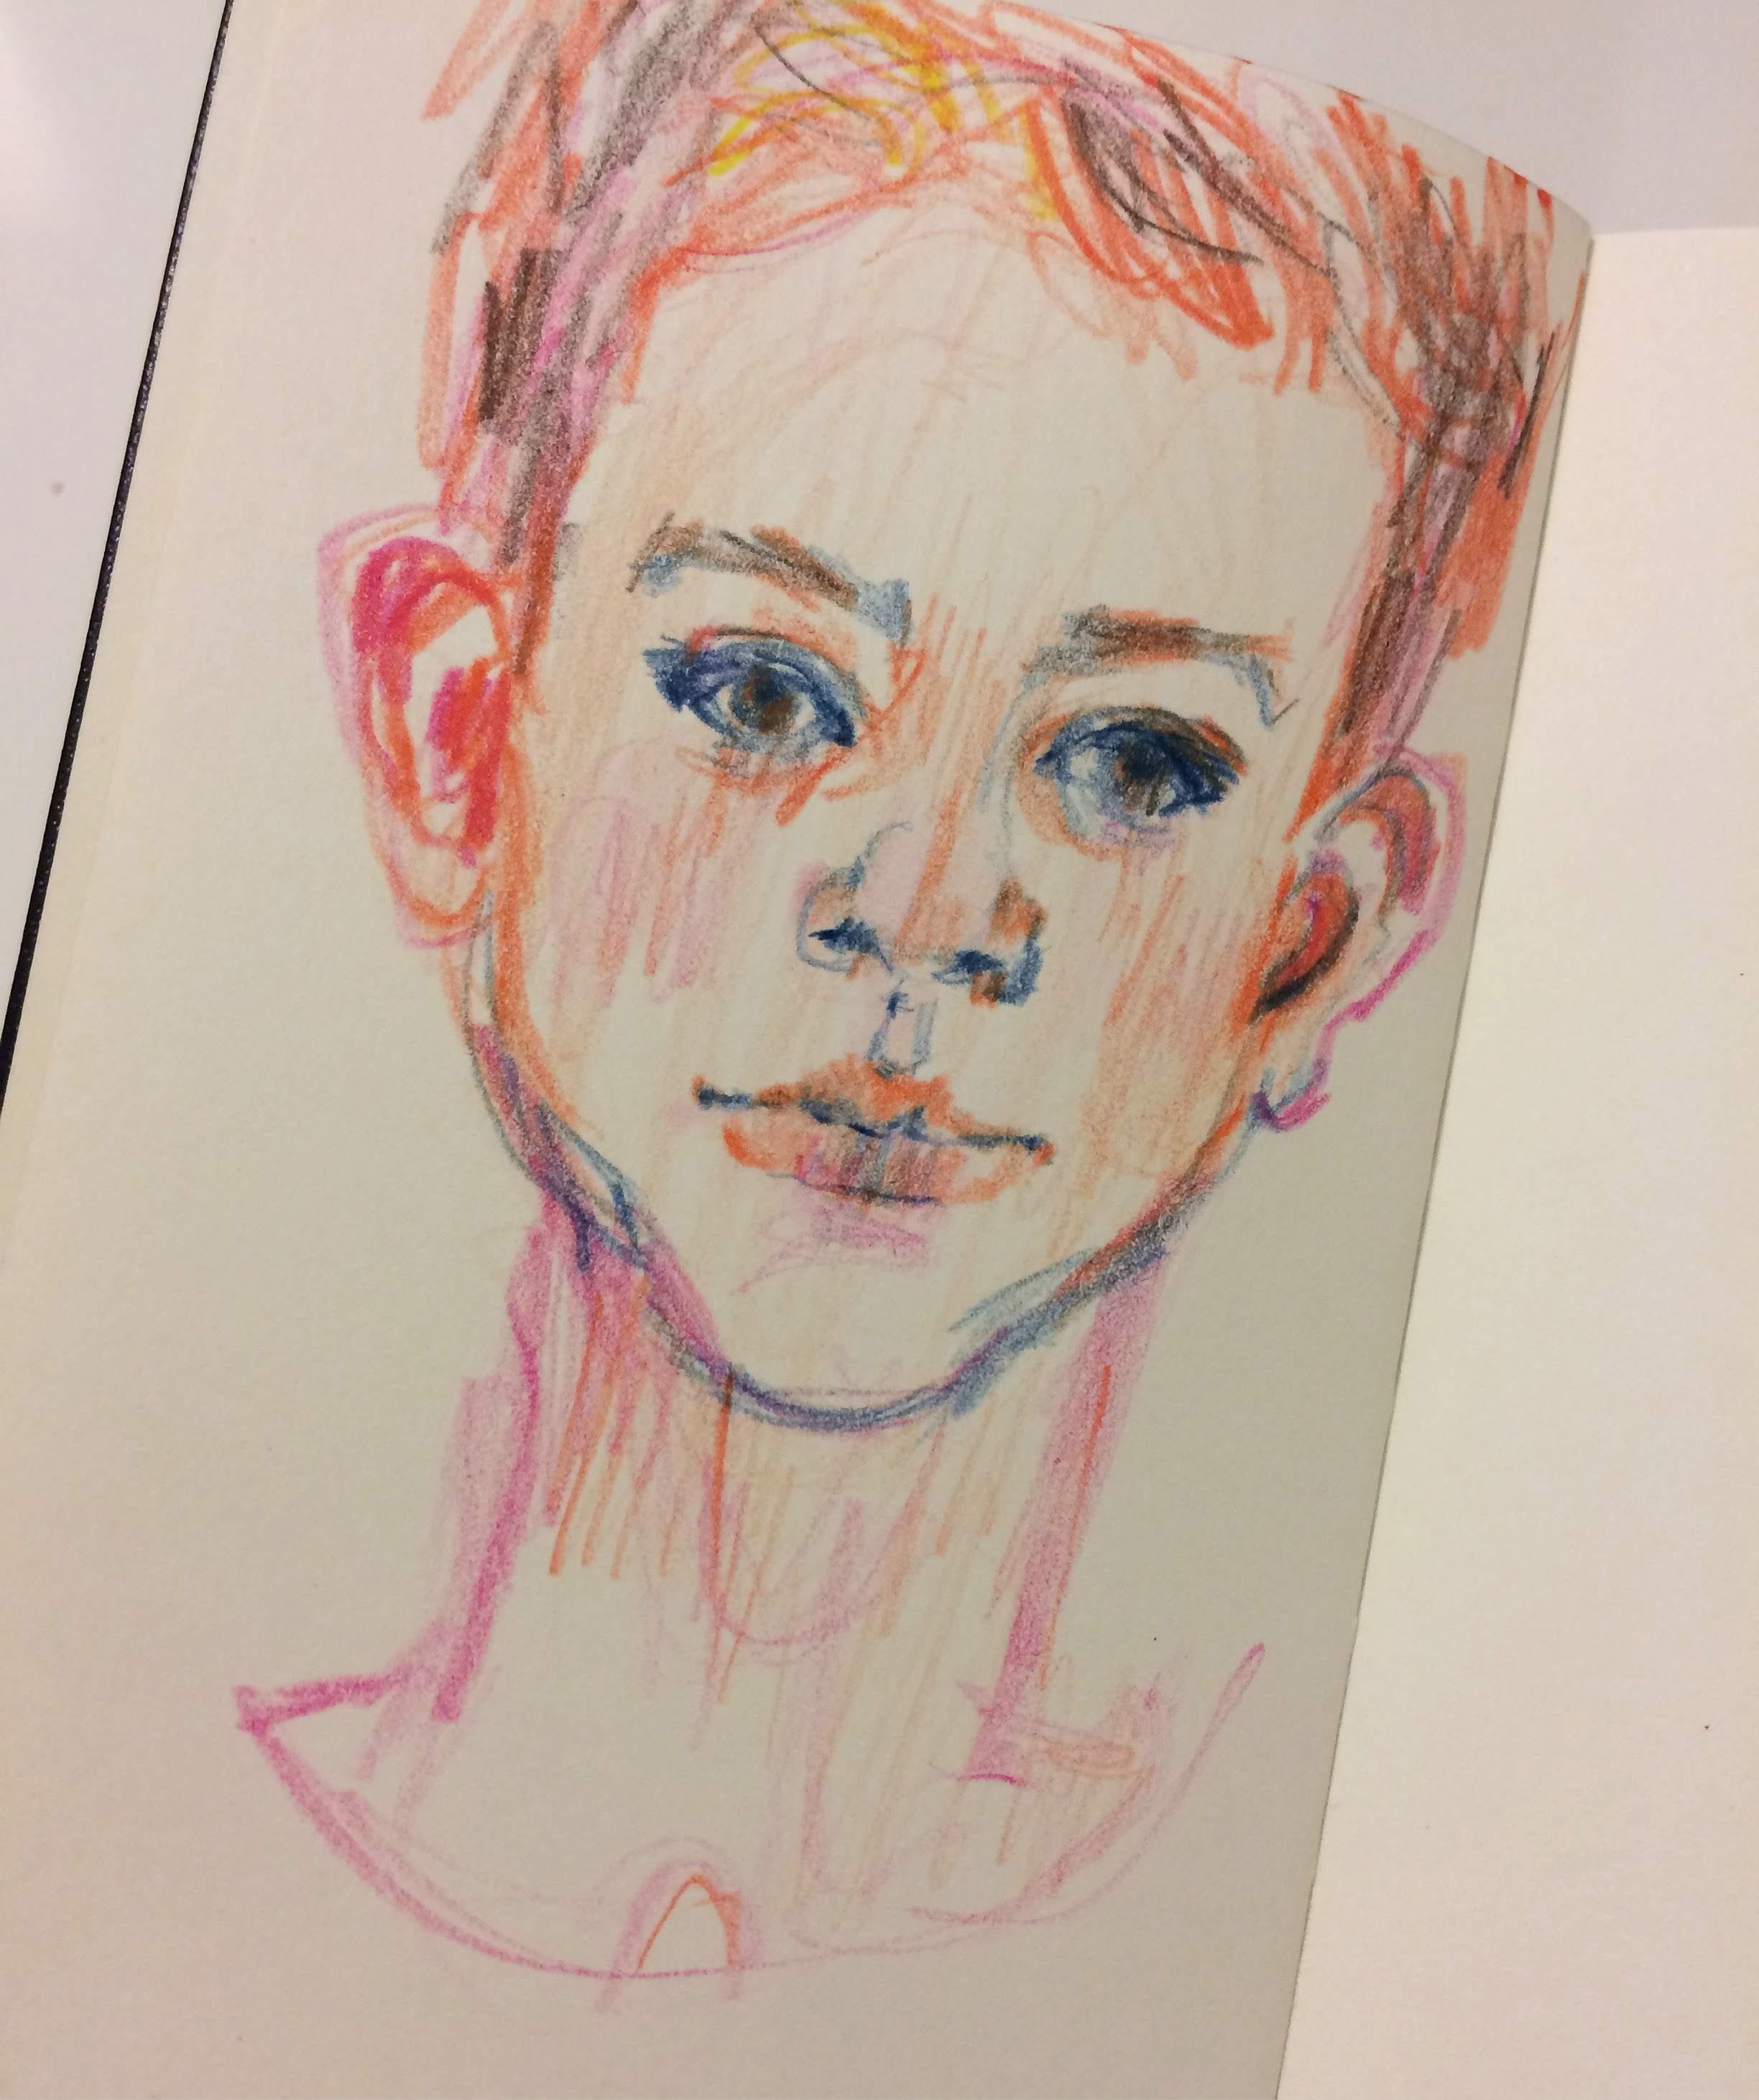 5 minute sketch of Sebastian